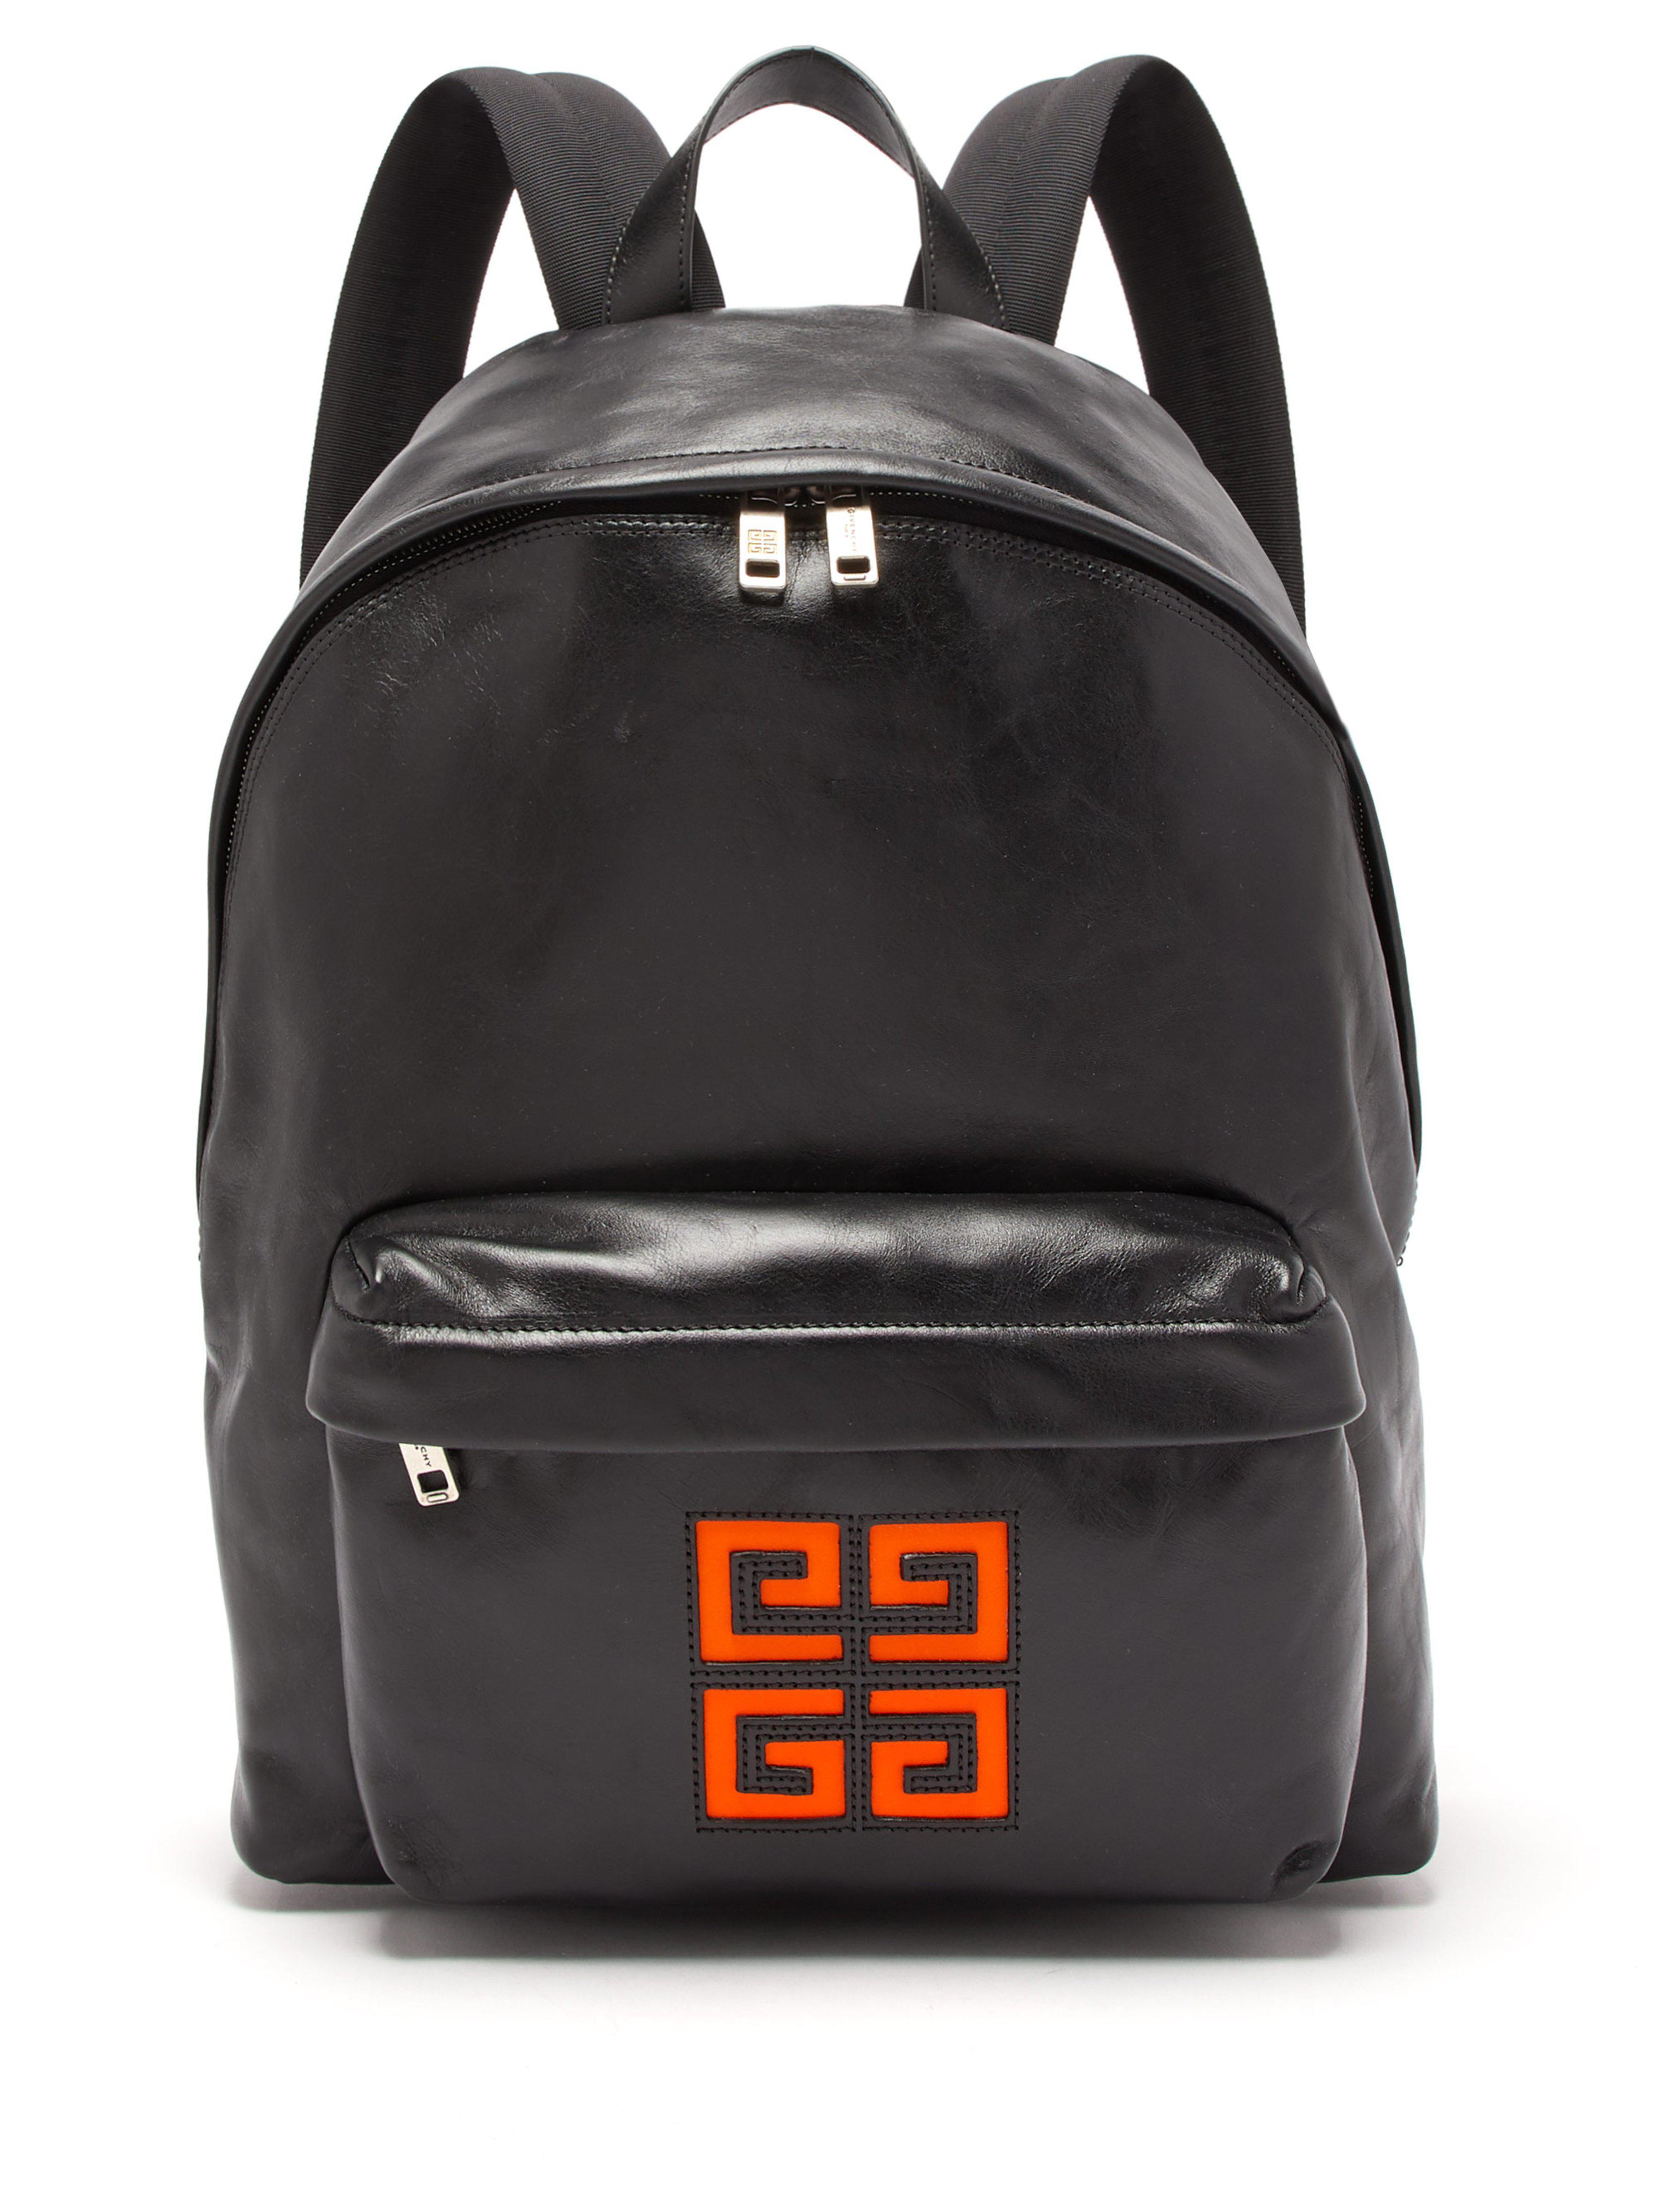 bd89f4d7173 Givenchy 4g Logo Leather Backpack in Black for Men - Lyst